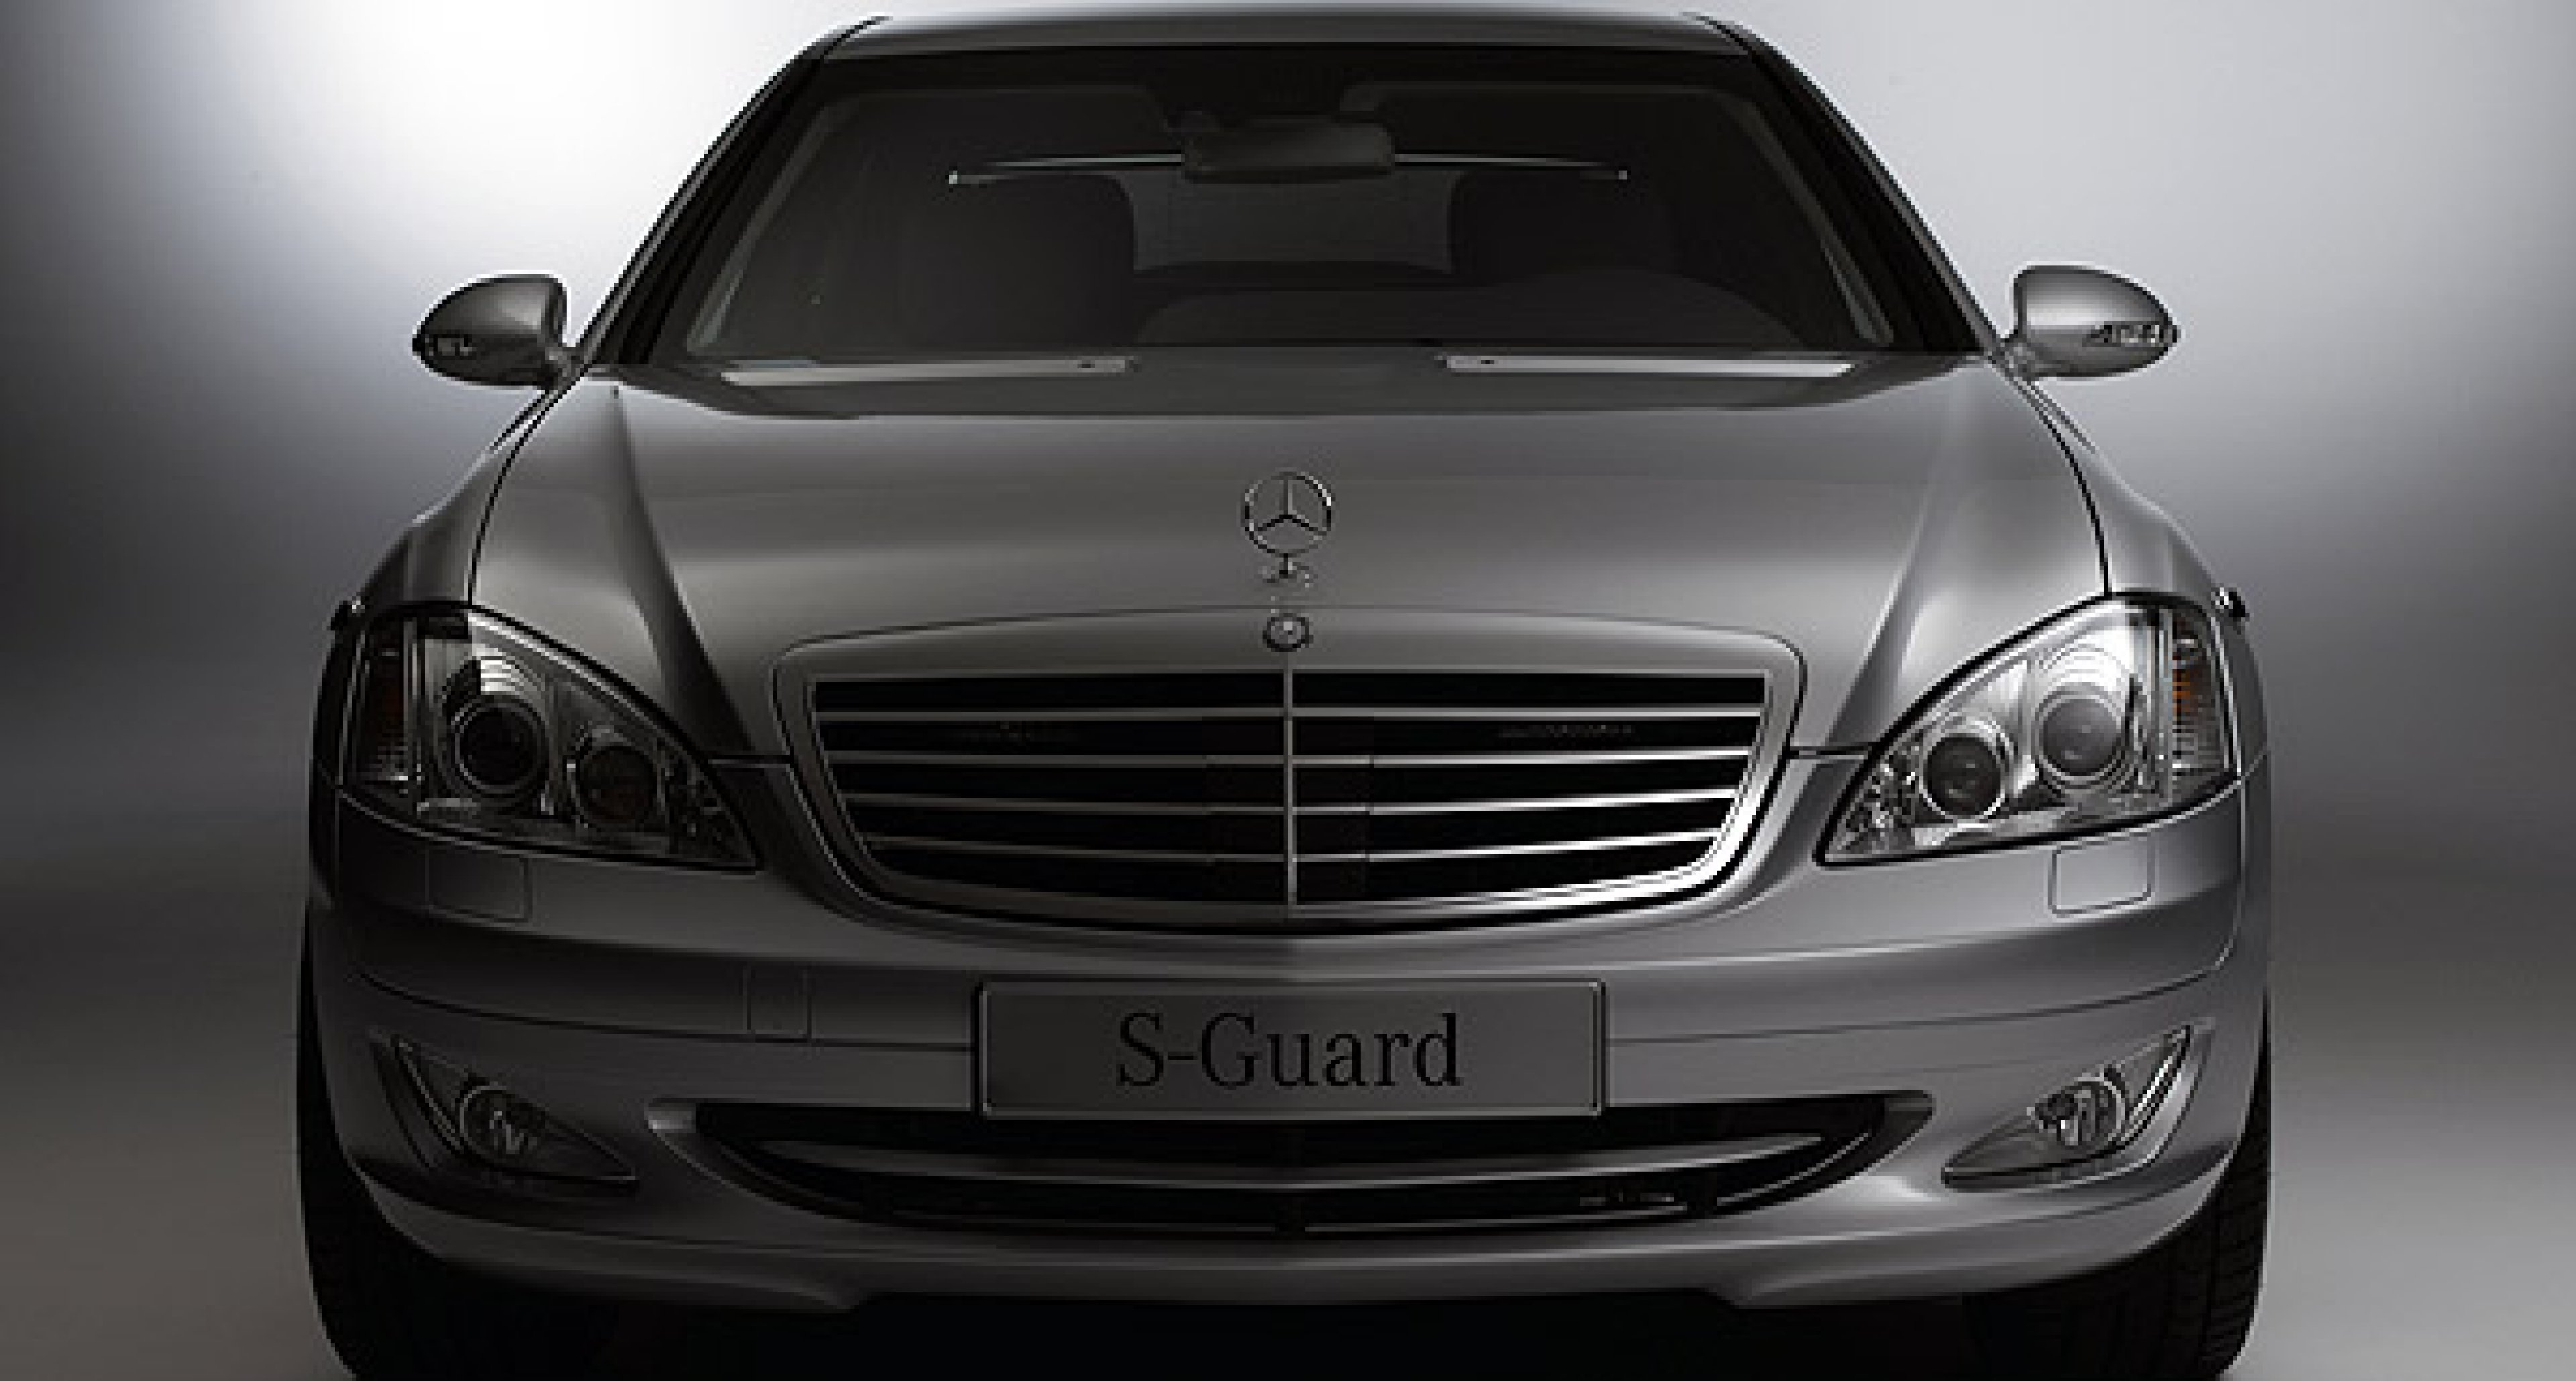 The new Mercedes-Benz S-Guard